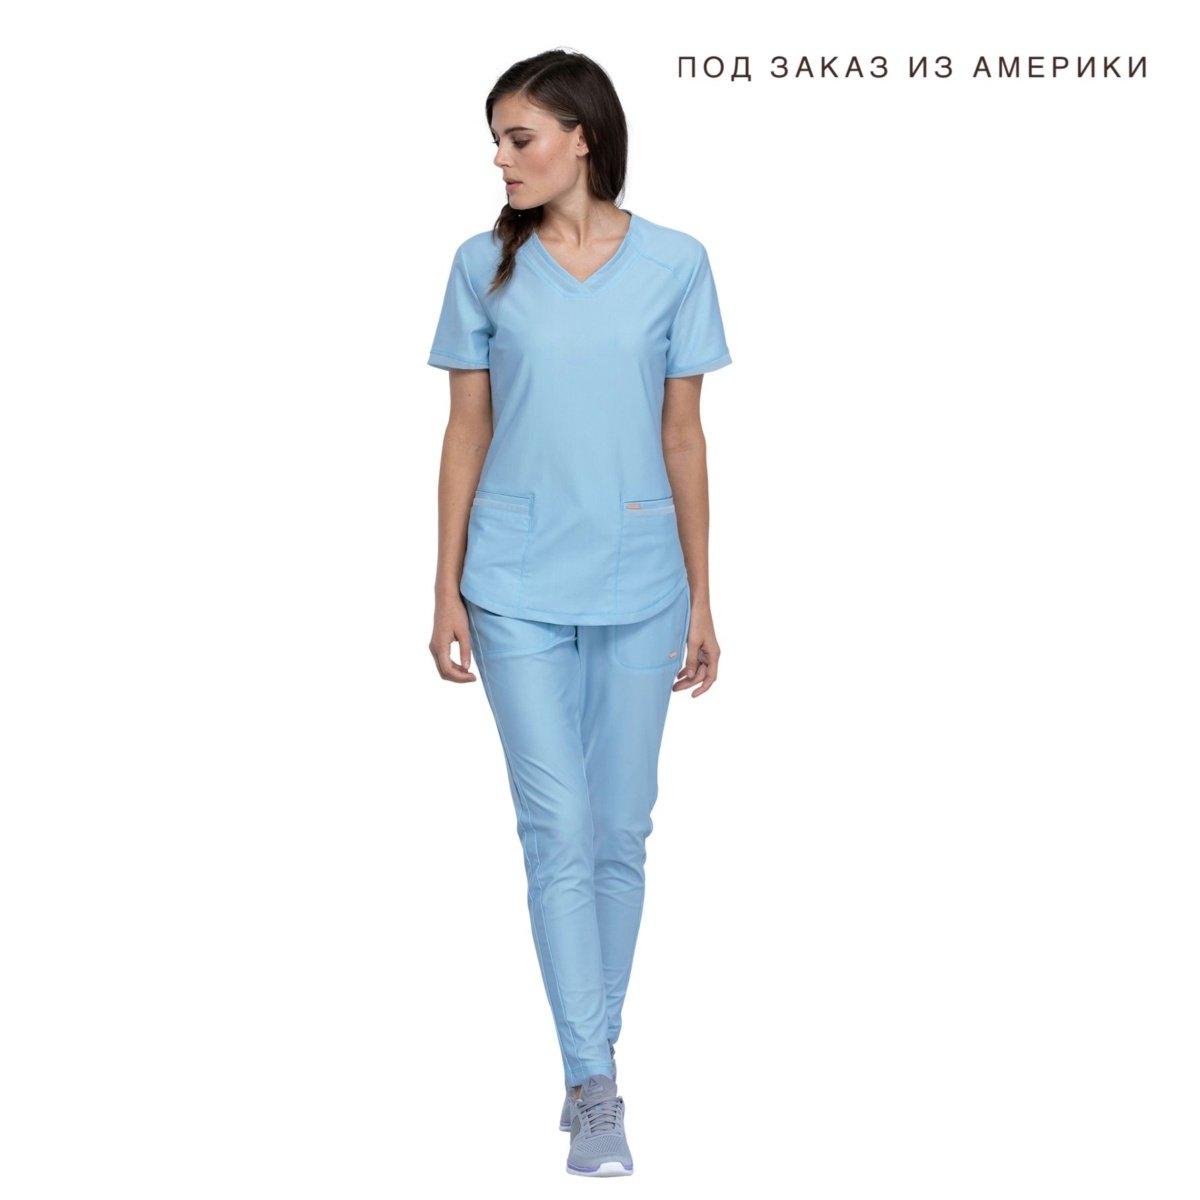 Женский медицинский костюм CHEROKEE FORM цвет sueb